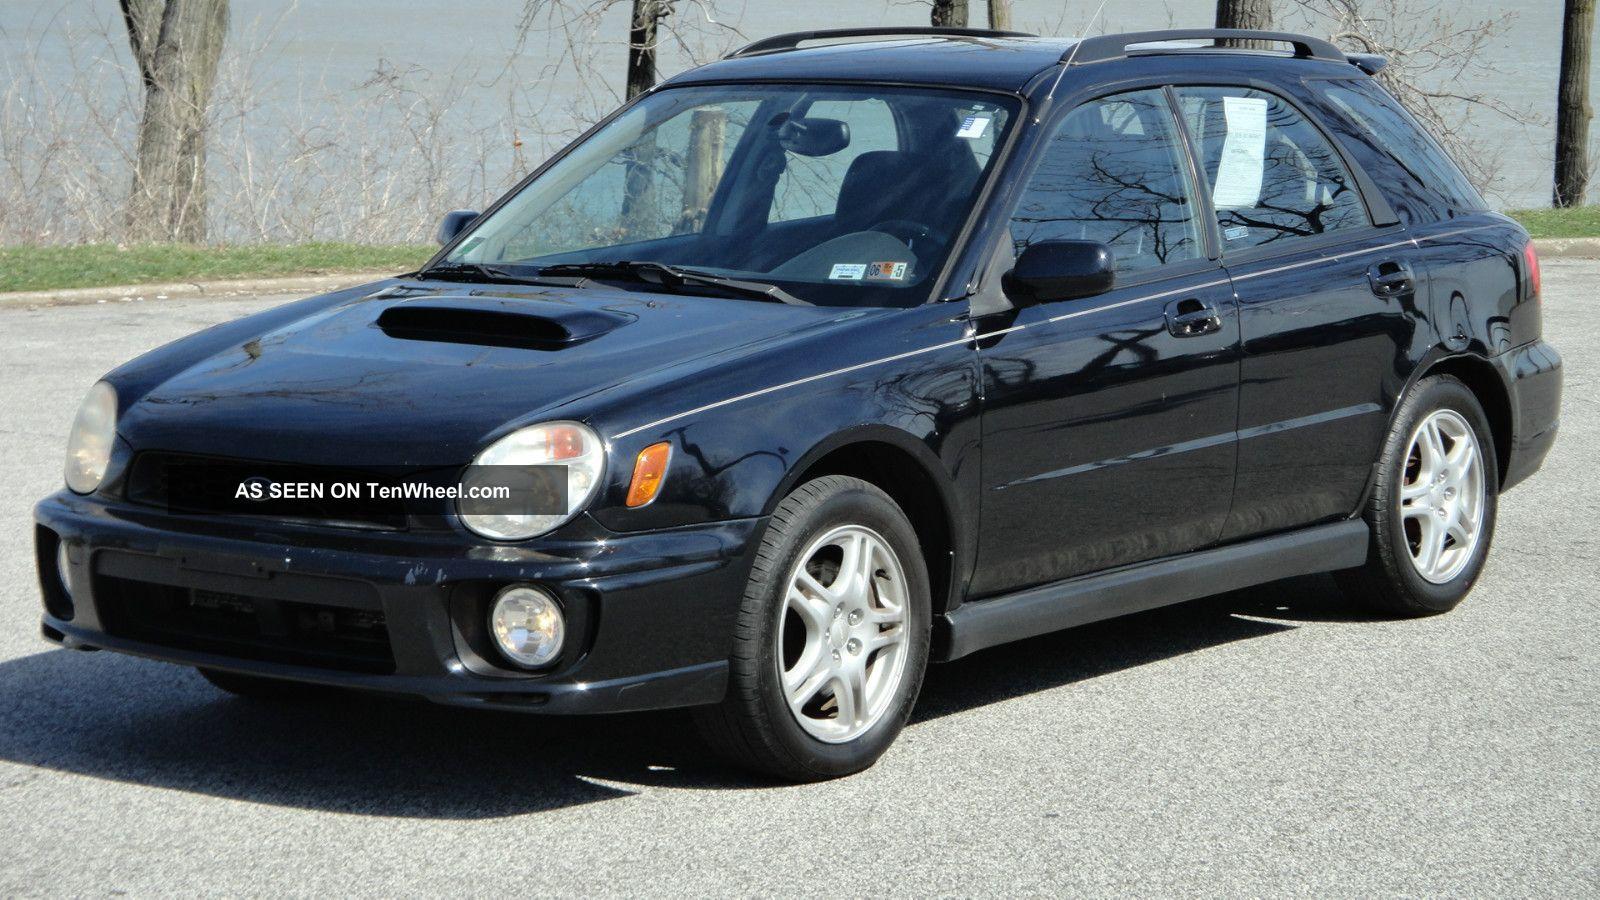 2003 subaru impreza wrx sport wagon 4 dr 2 0l turbo awd manual